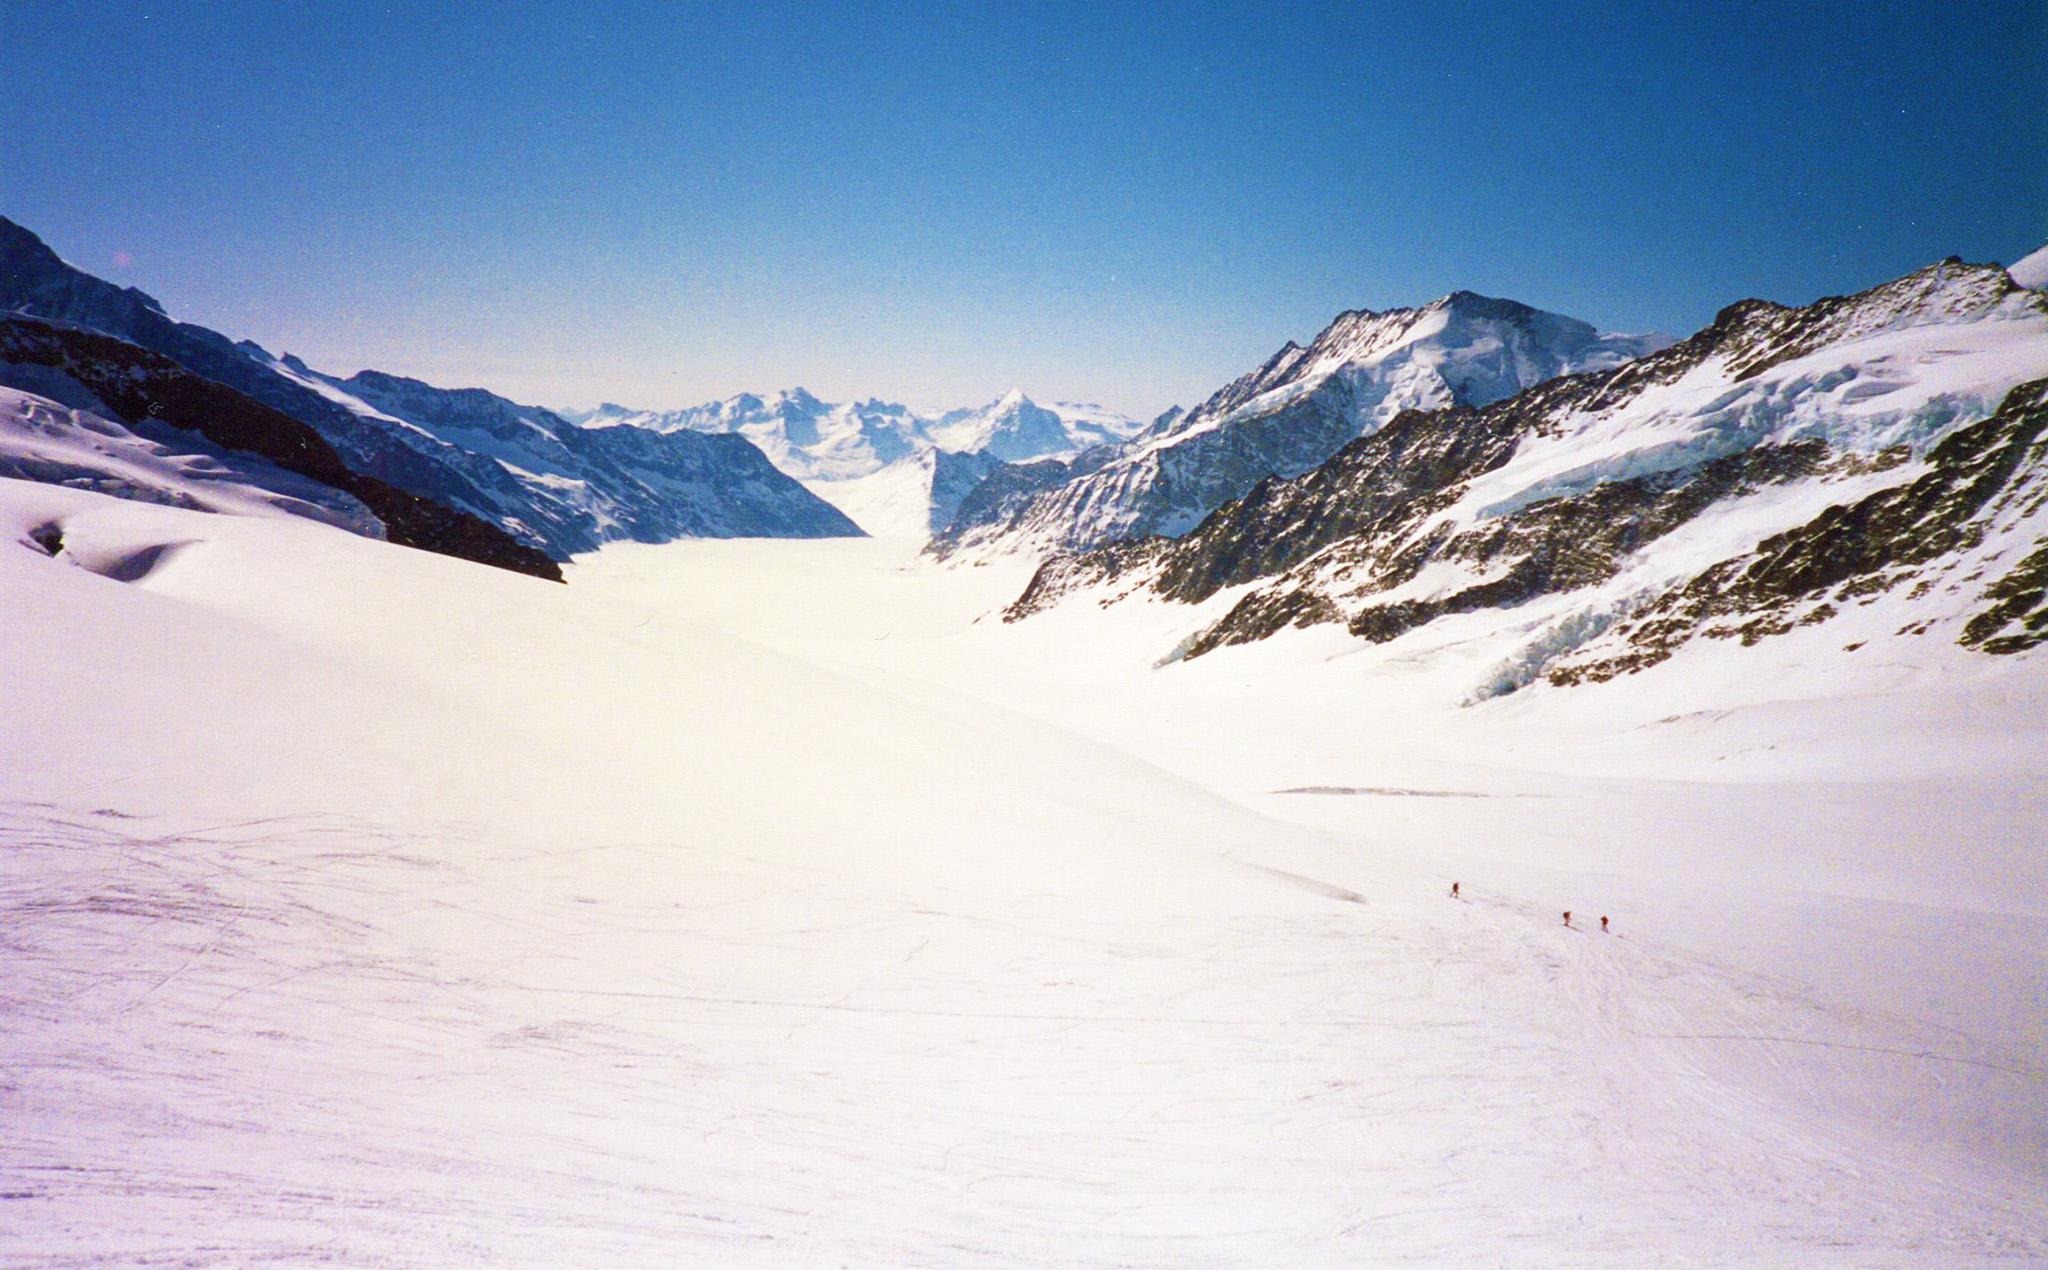 kt_2020_360_Keytours_excursions_Swisstours_interlaken_jungfraujoch5_2048_10